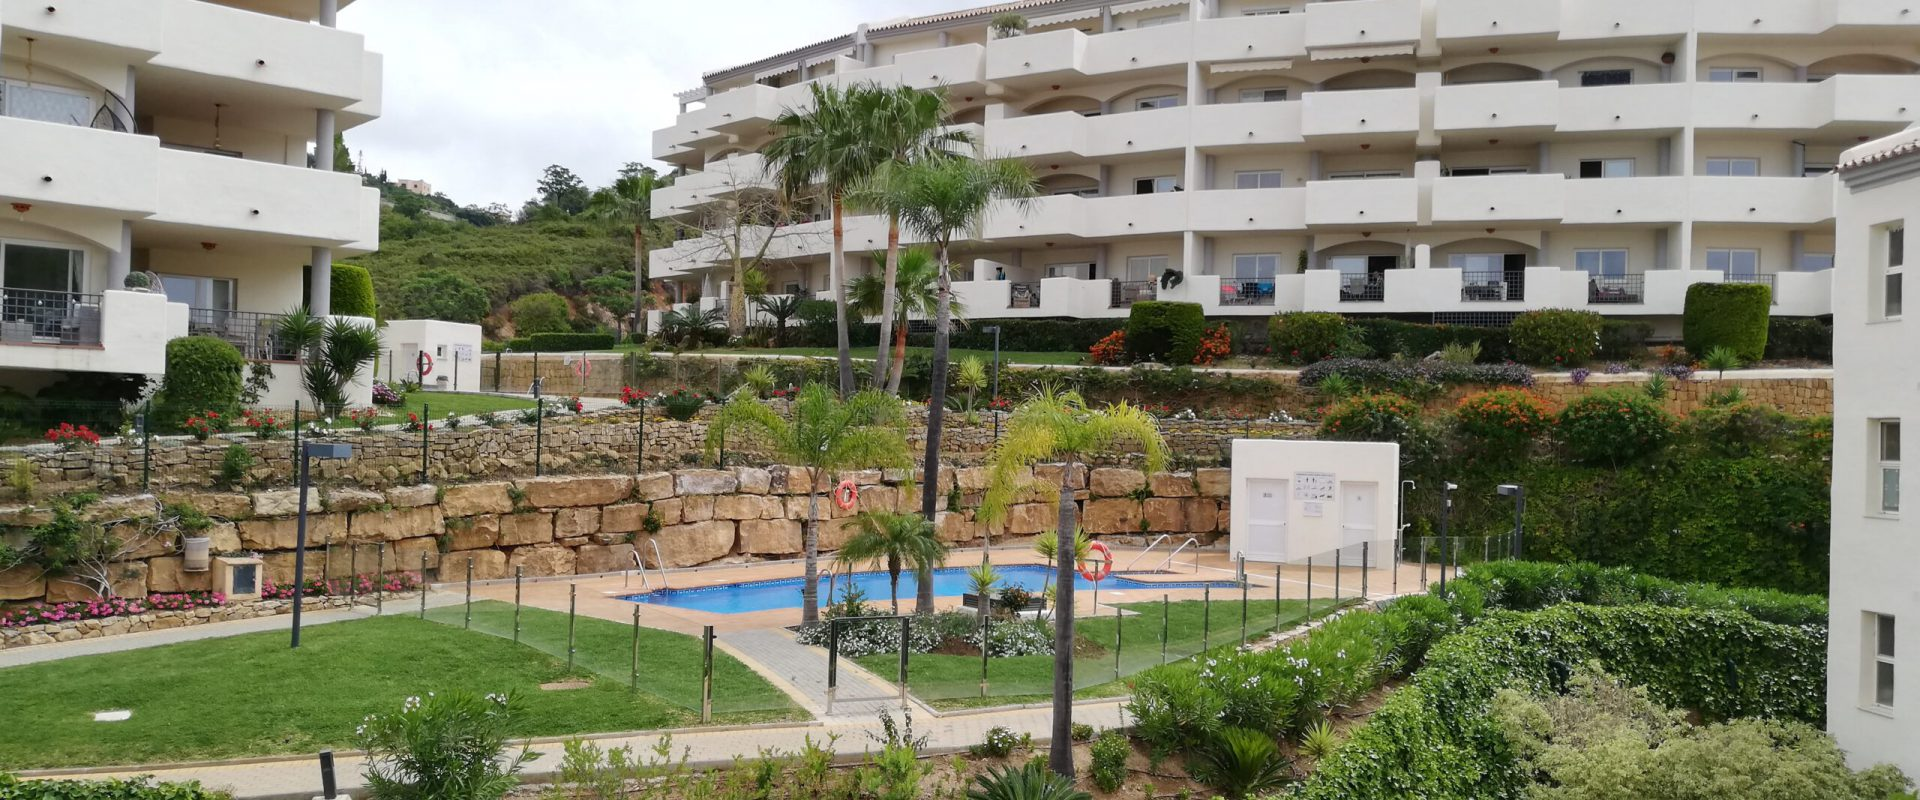 Santa María Green Hills_1